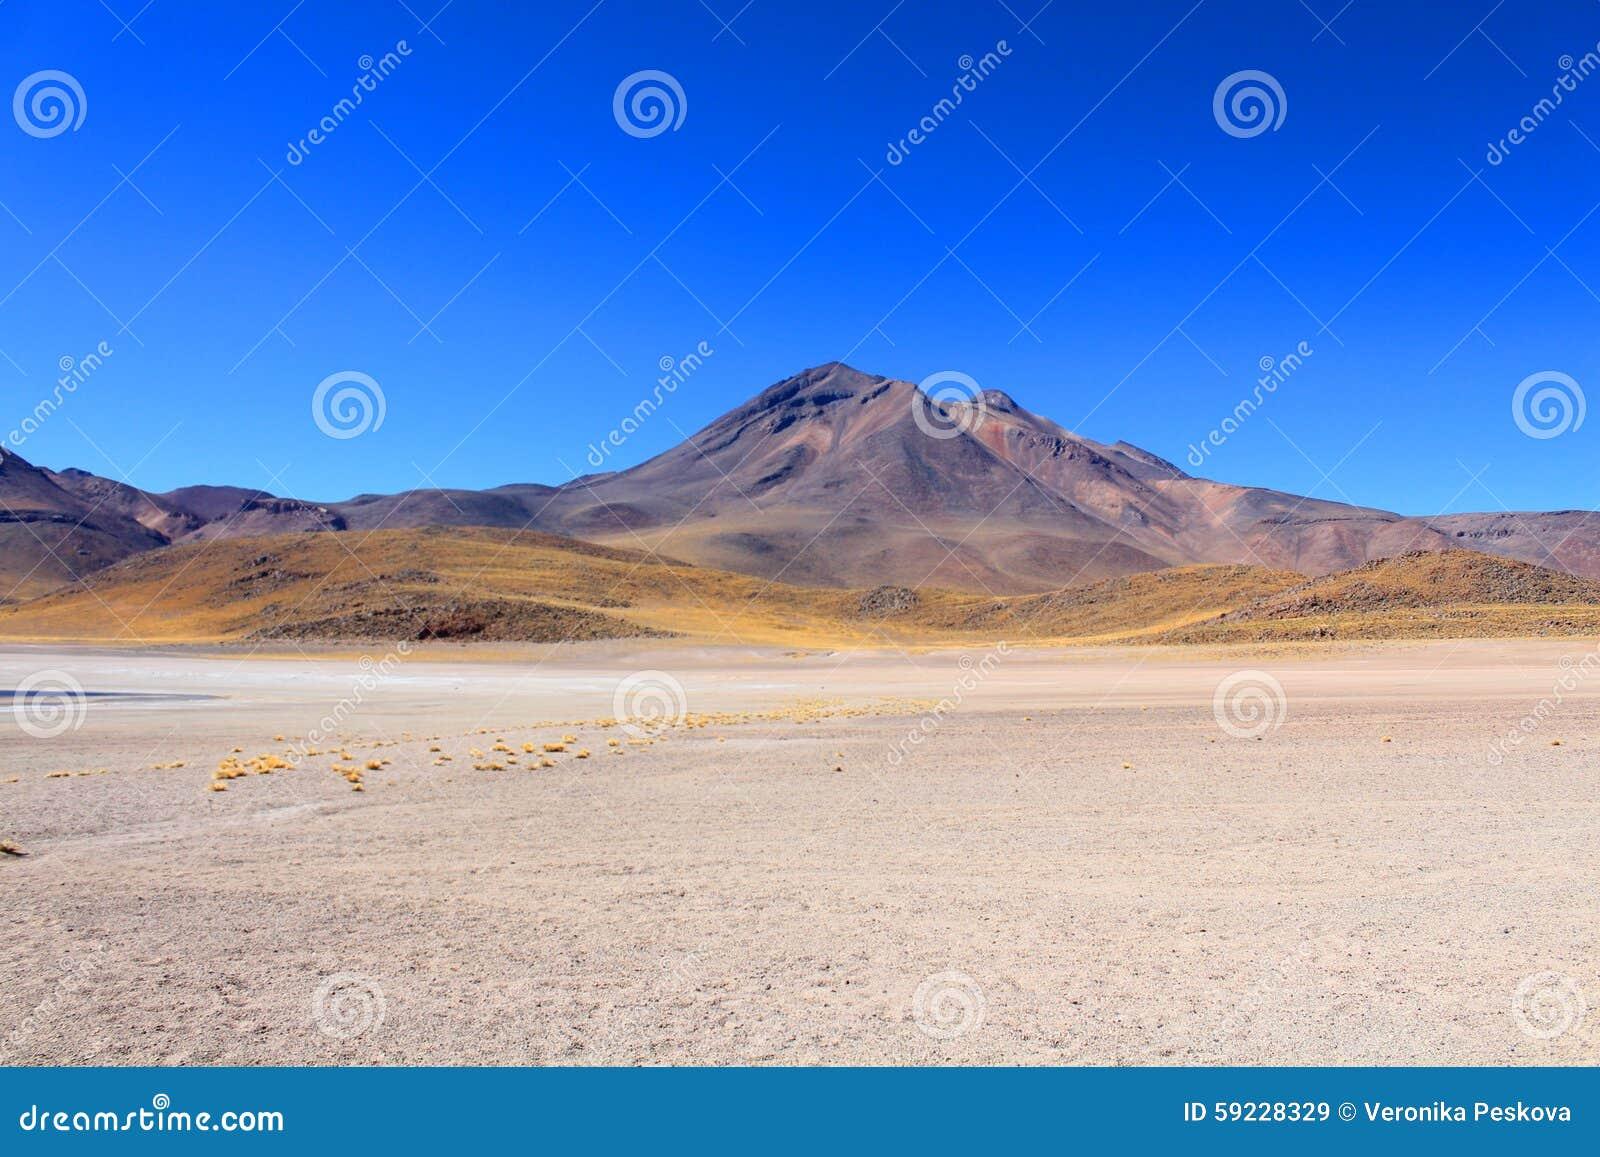 Download Paisaje chileno hermoso imagen de archivo. Imagen de plano - 59228329